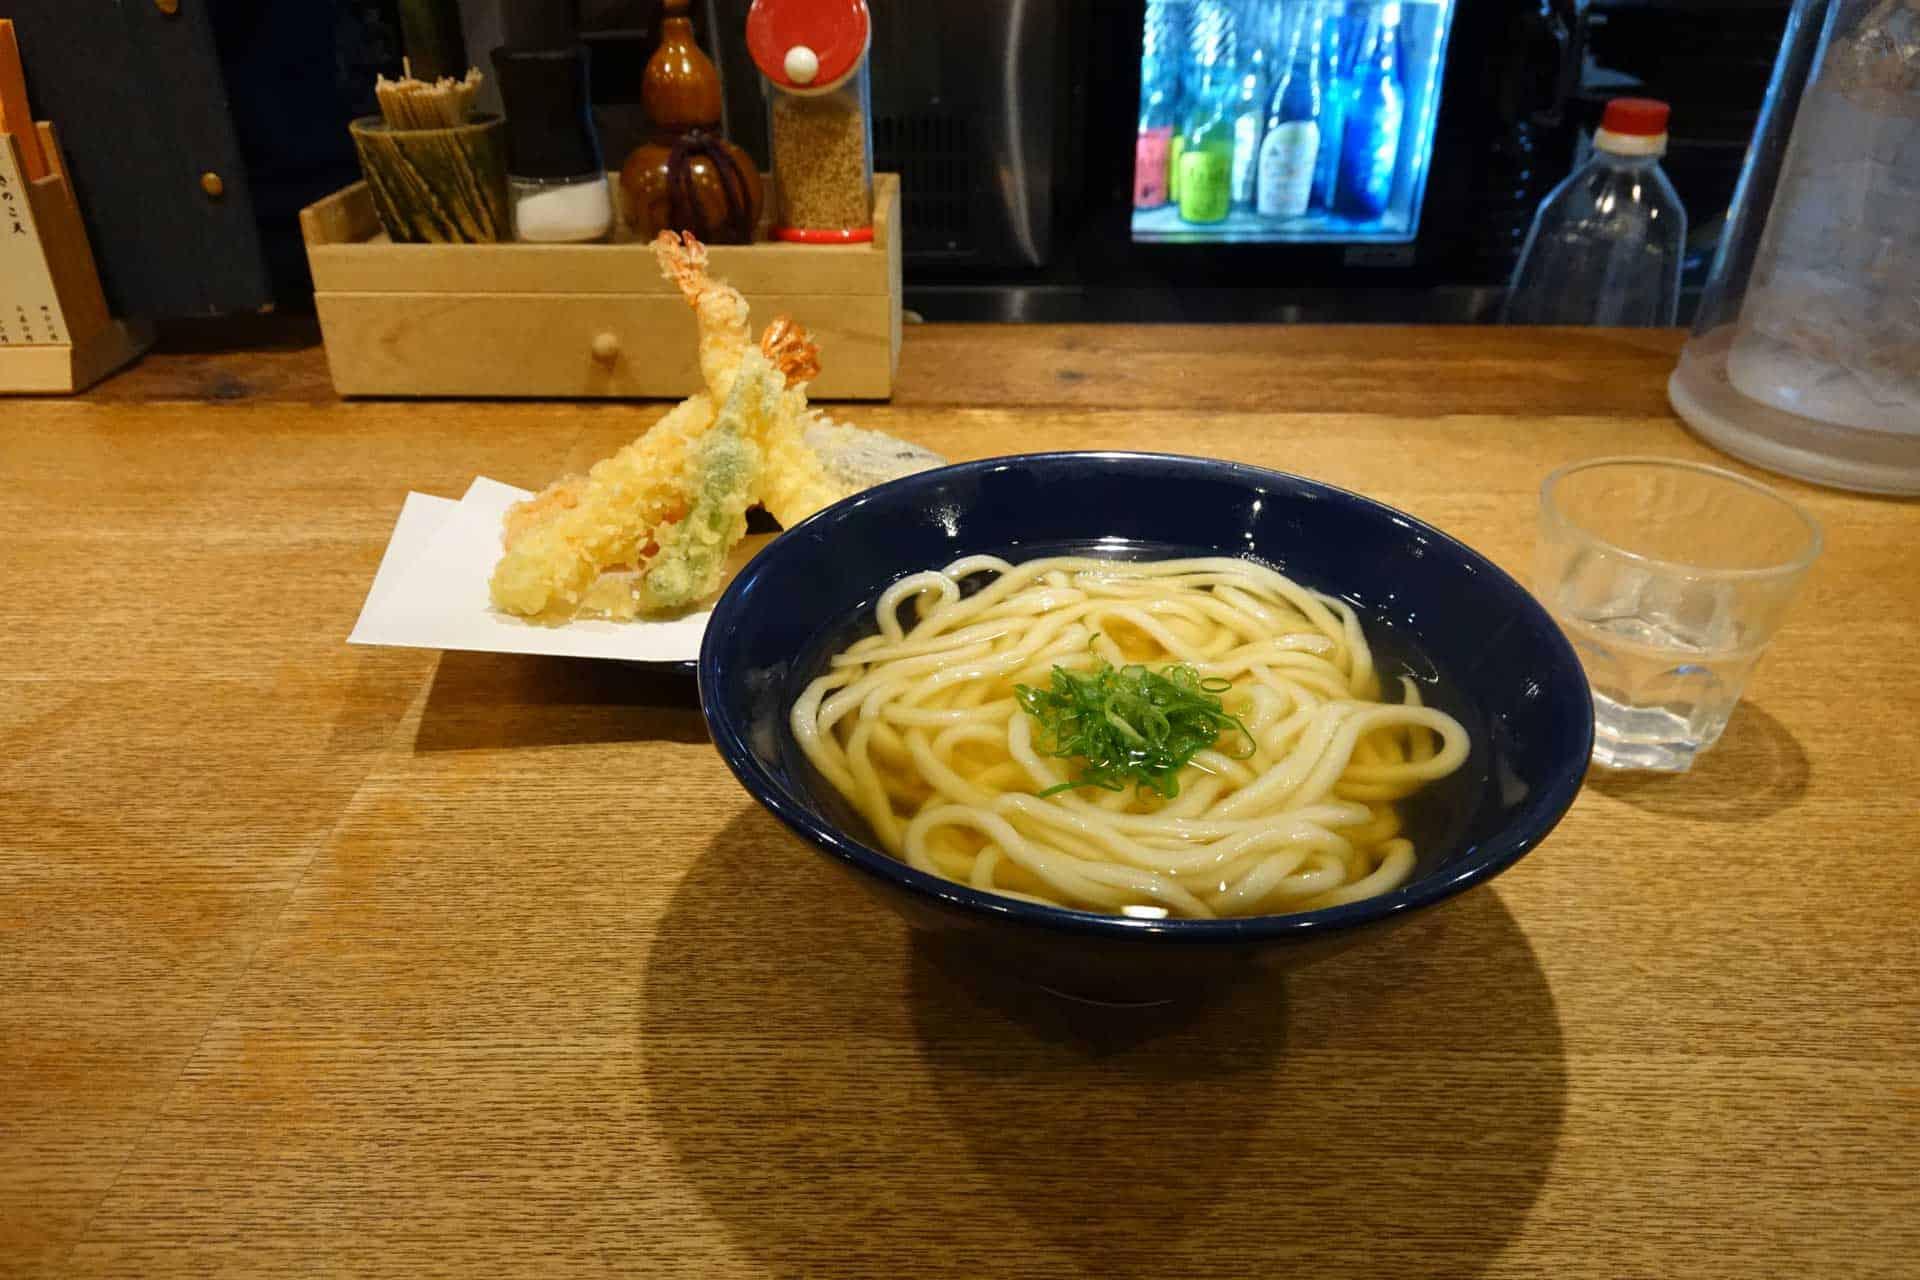 Seeking Spice in Japan 14: Shin Udon